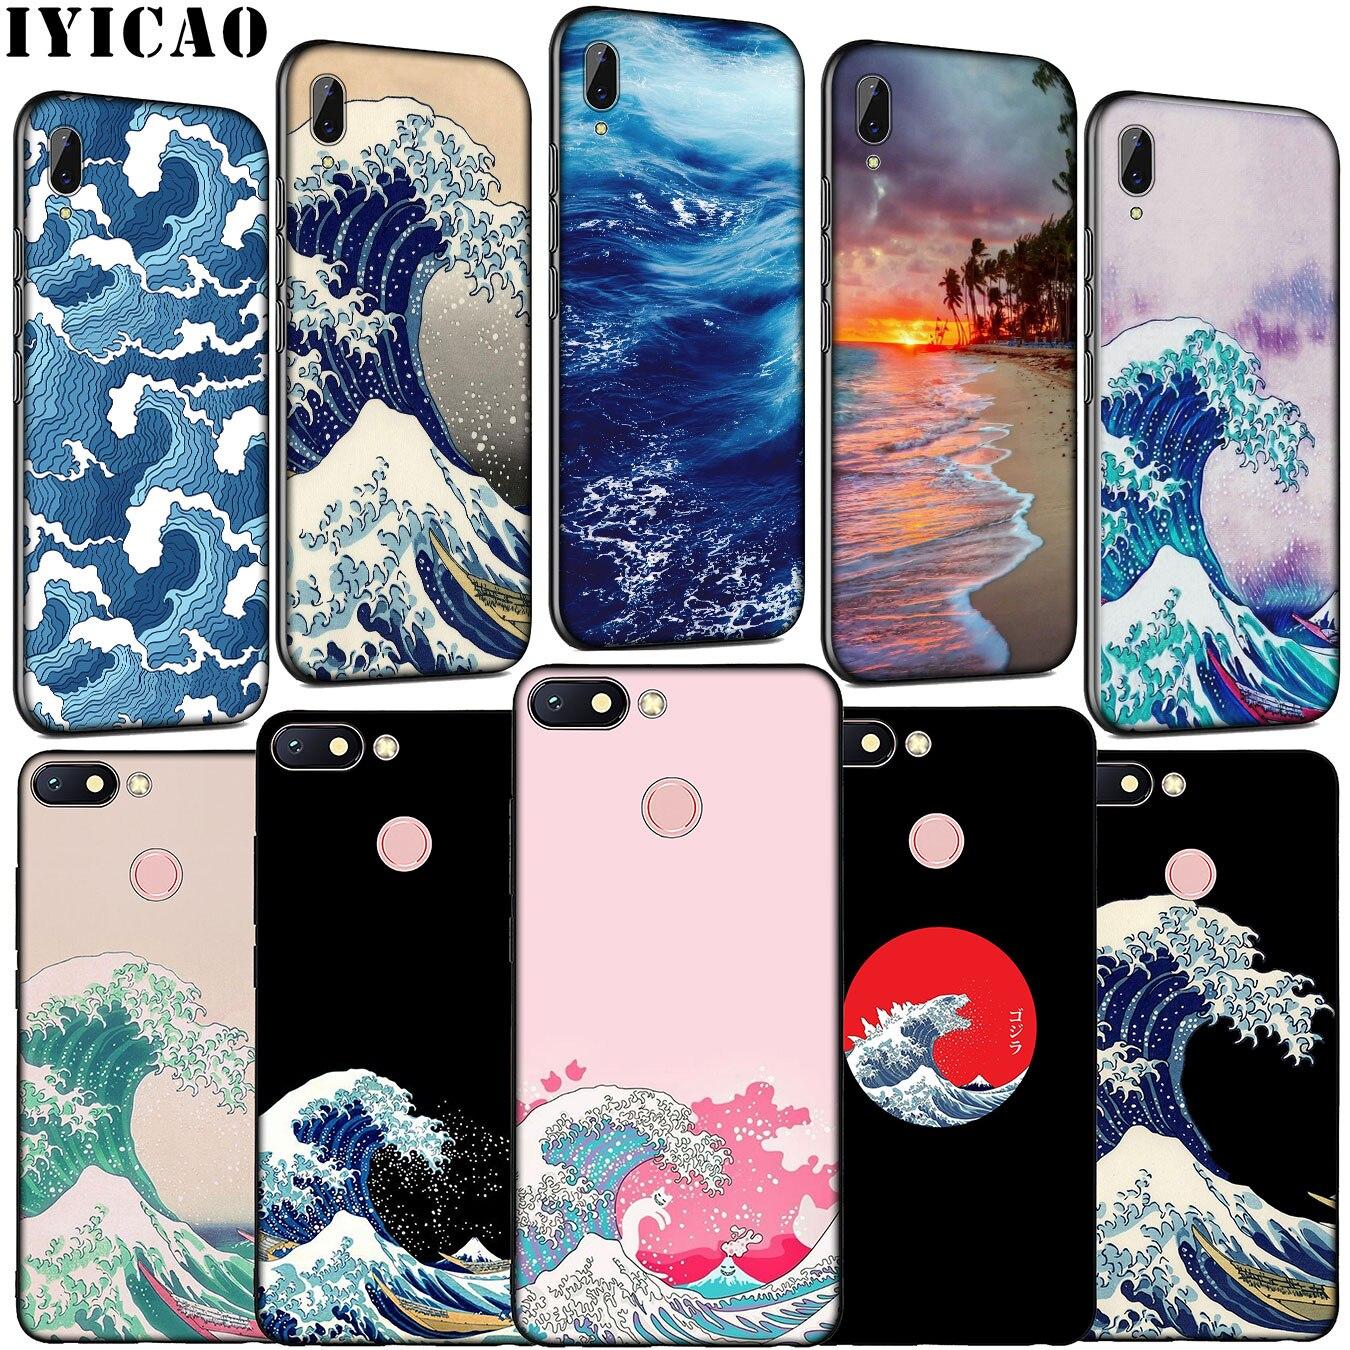 La Gran Ola de Kanagawa de silicona suave funda de teléfono para Xiaomi Redmi Note 8 8T 8A 7 7A 6 6A 5 5A K30 K20 Pro ir S2 cubierta